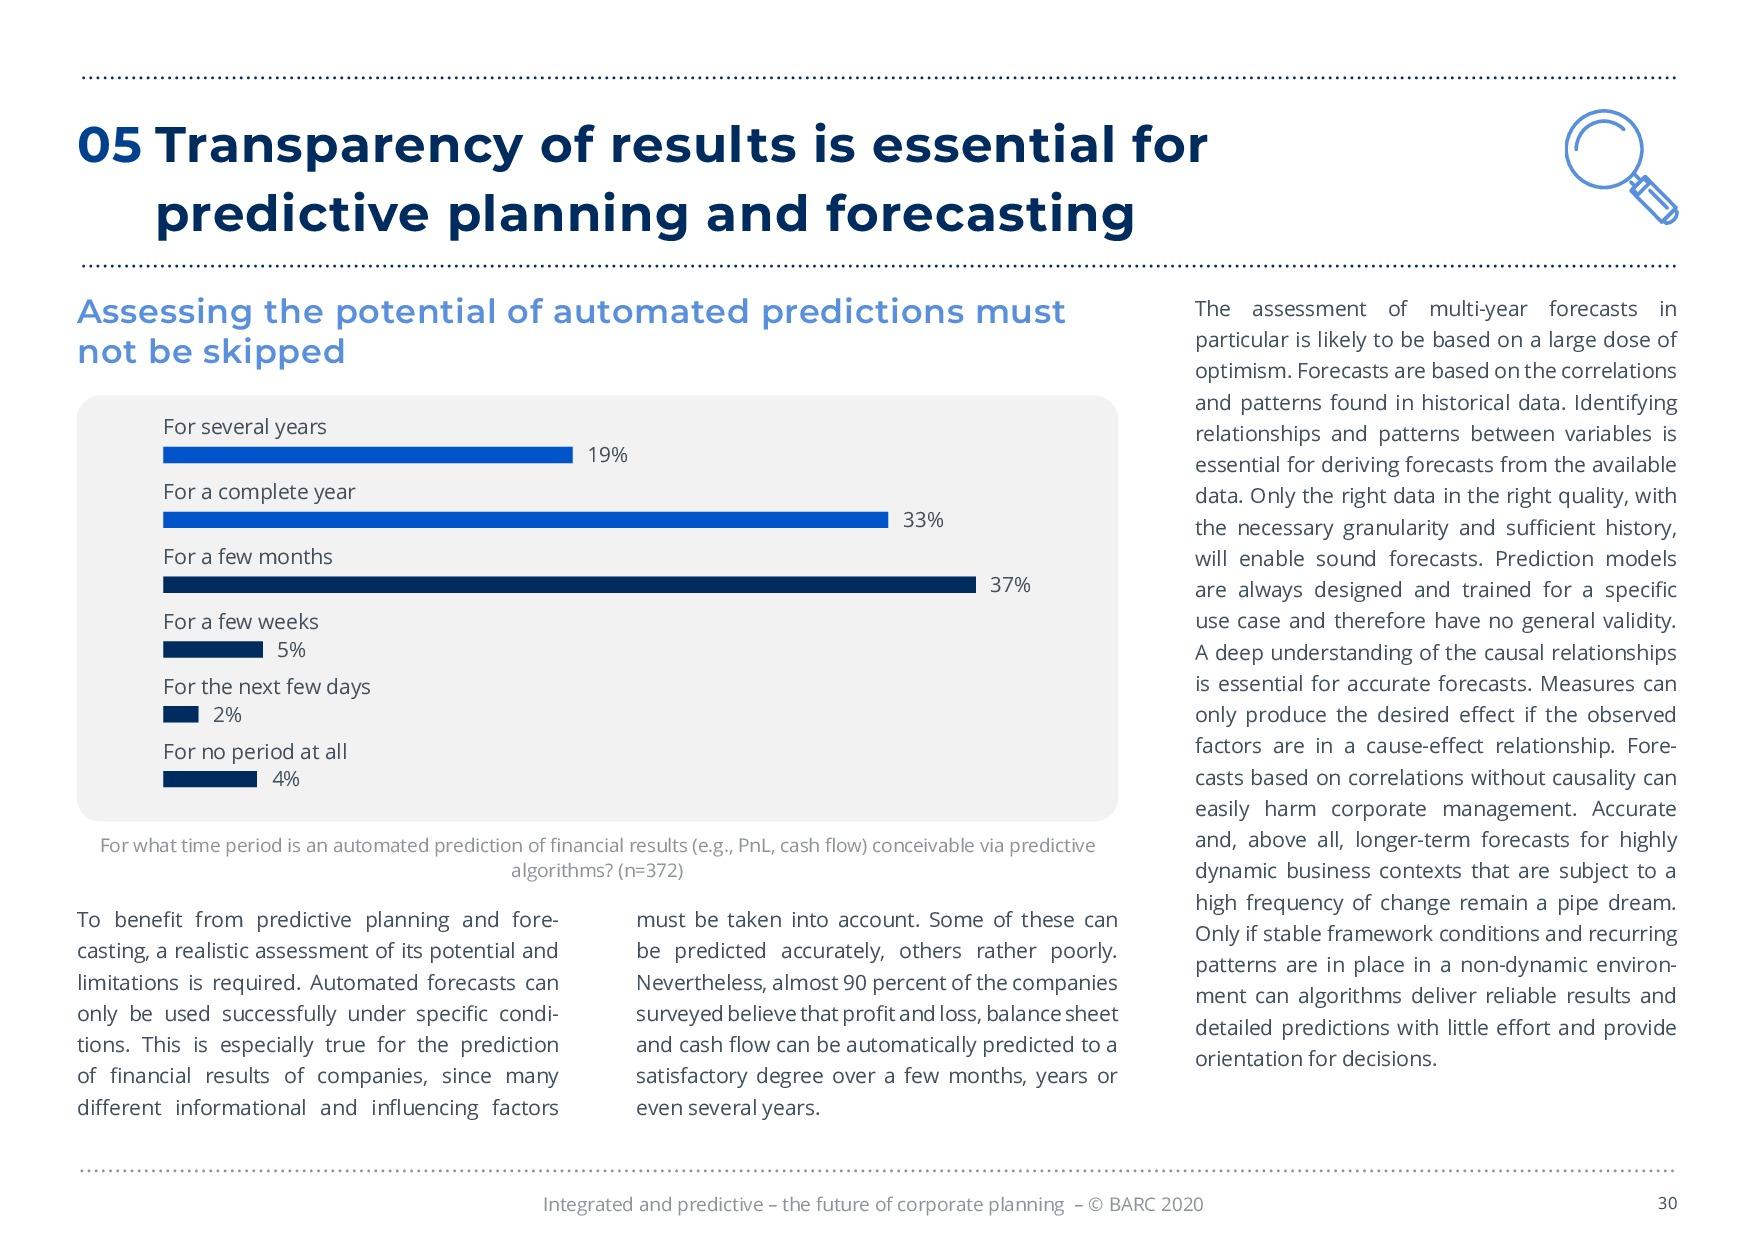 BARC – 統合と予測 – 経営計画の未来 | Page 30